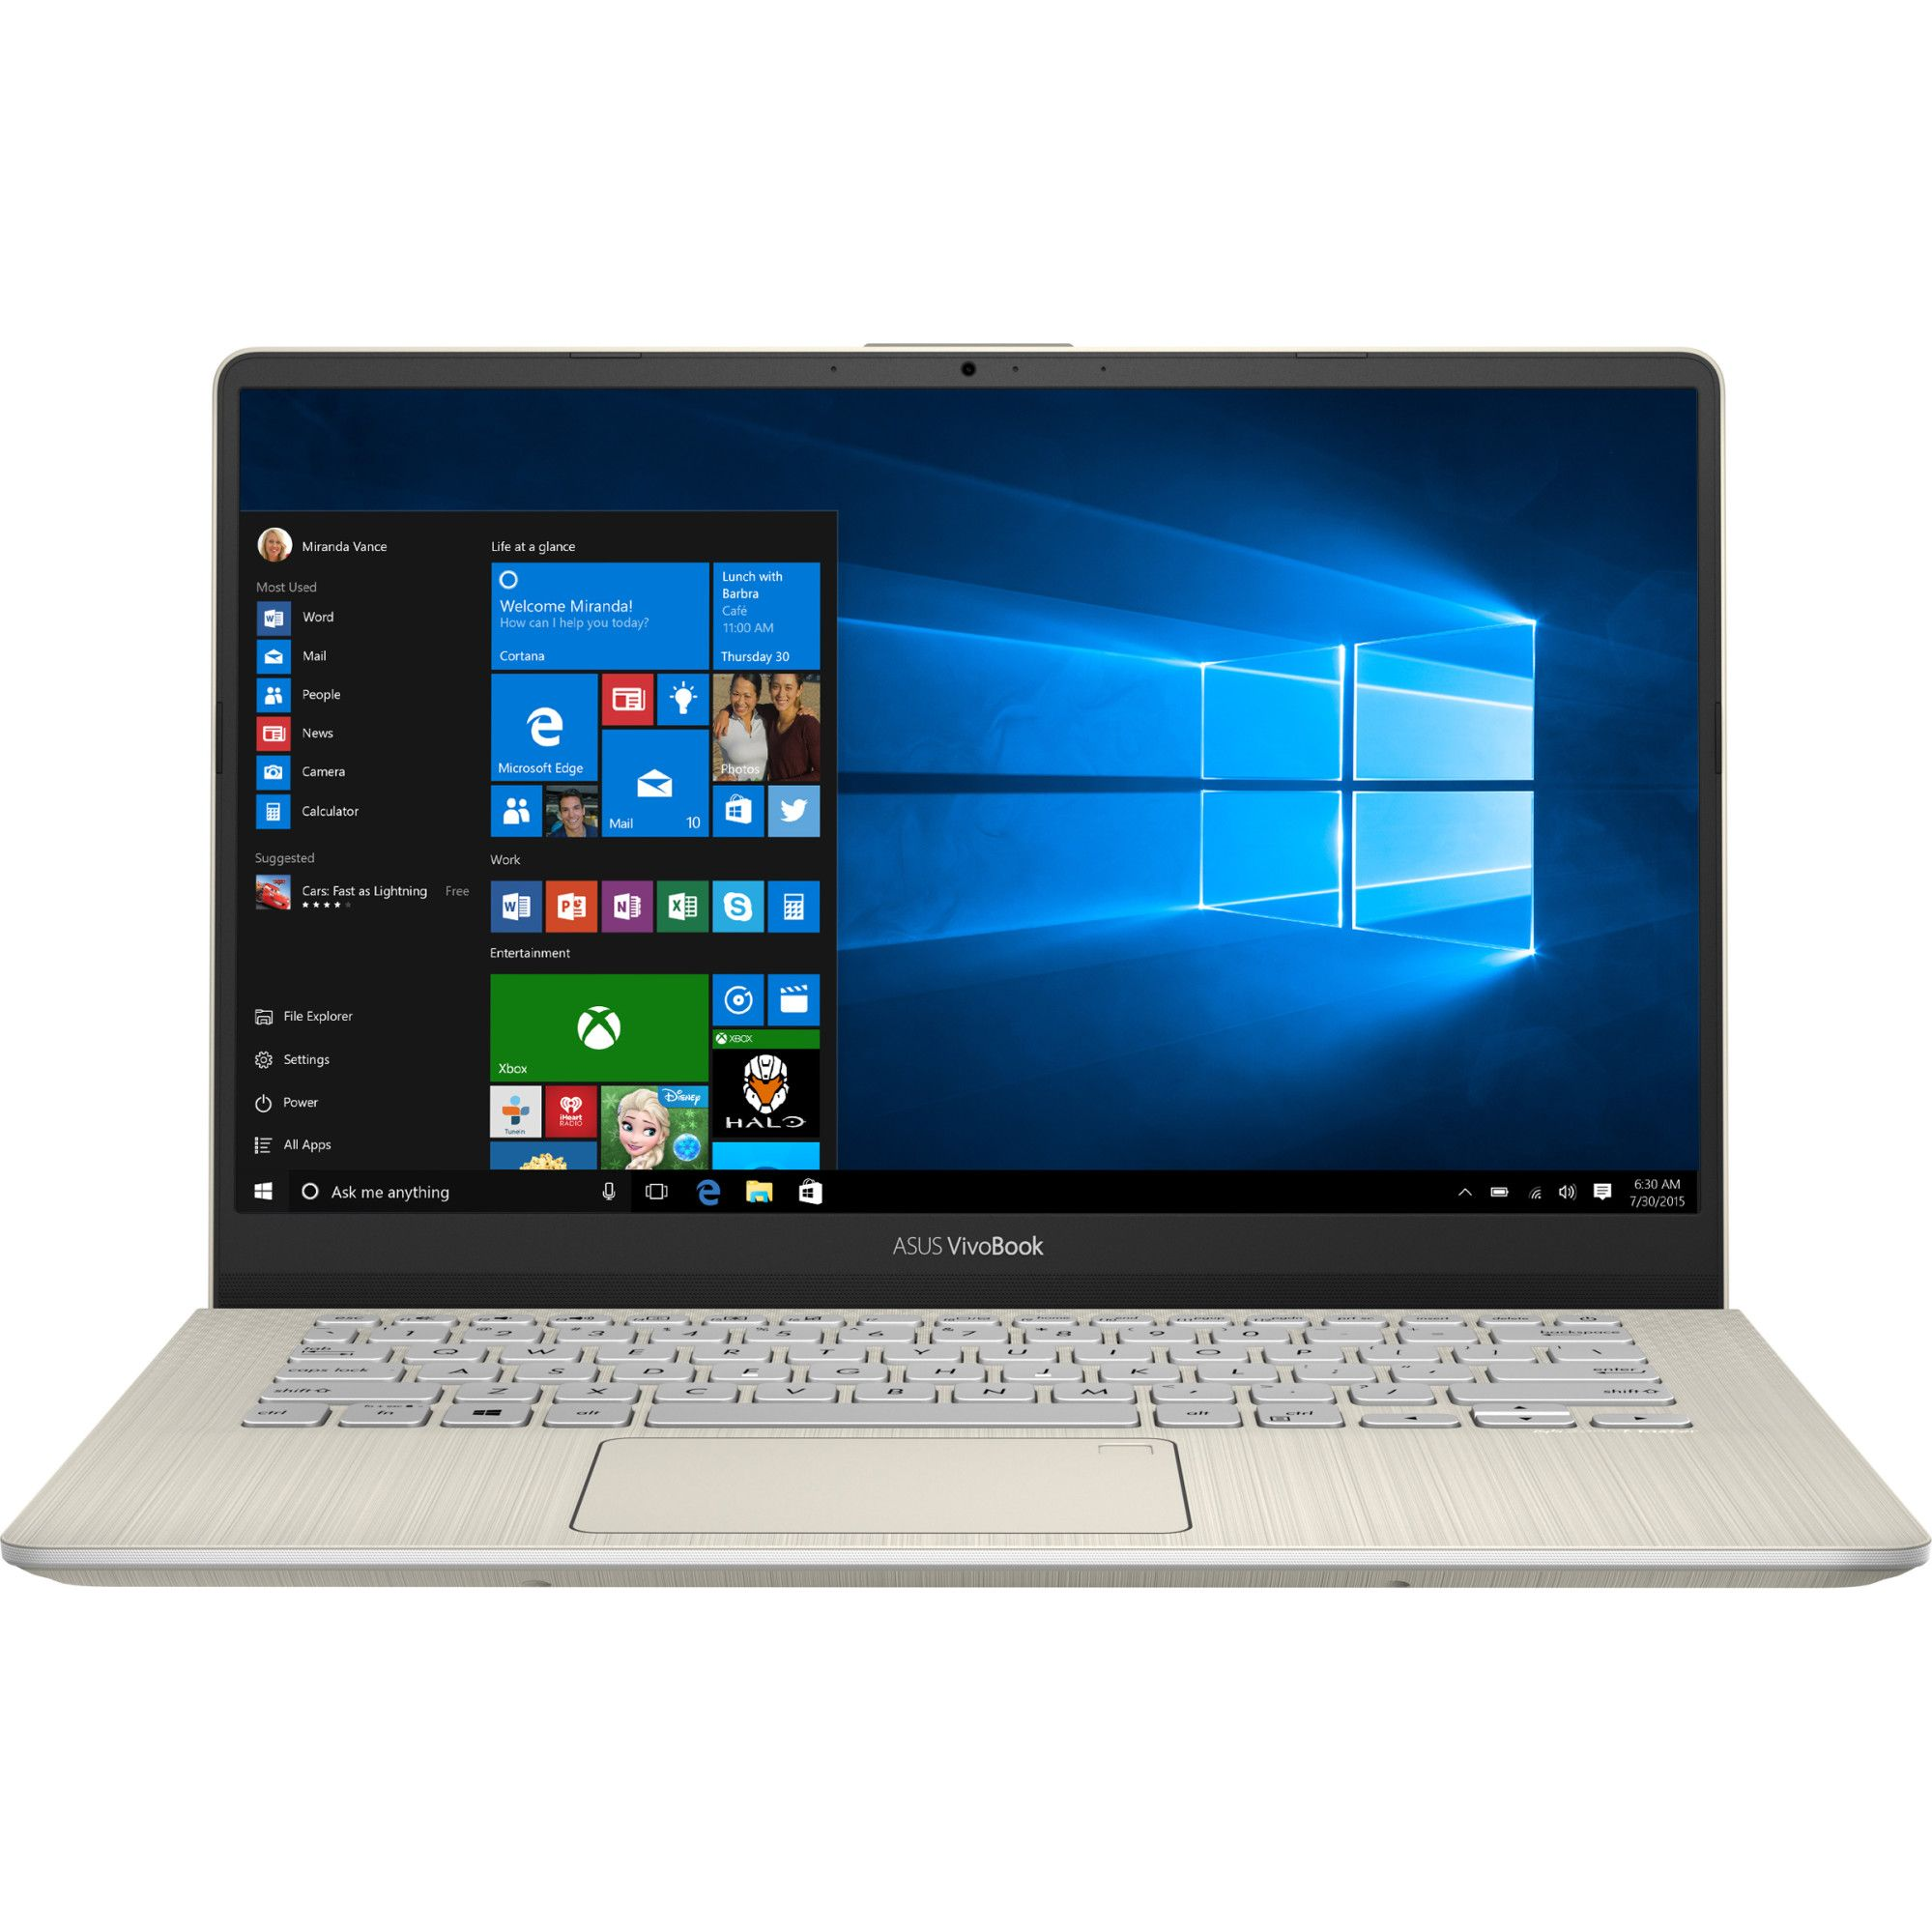 Notebook Asus VivoBook S430FA 14 Full HD Intel Core i5-8265U RAM 8GB SSD 256GB Windows 10 Home Auriu